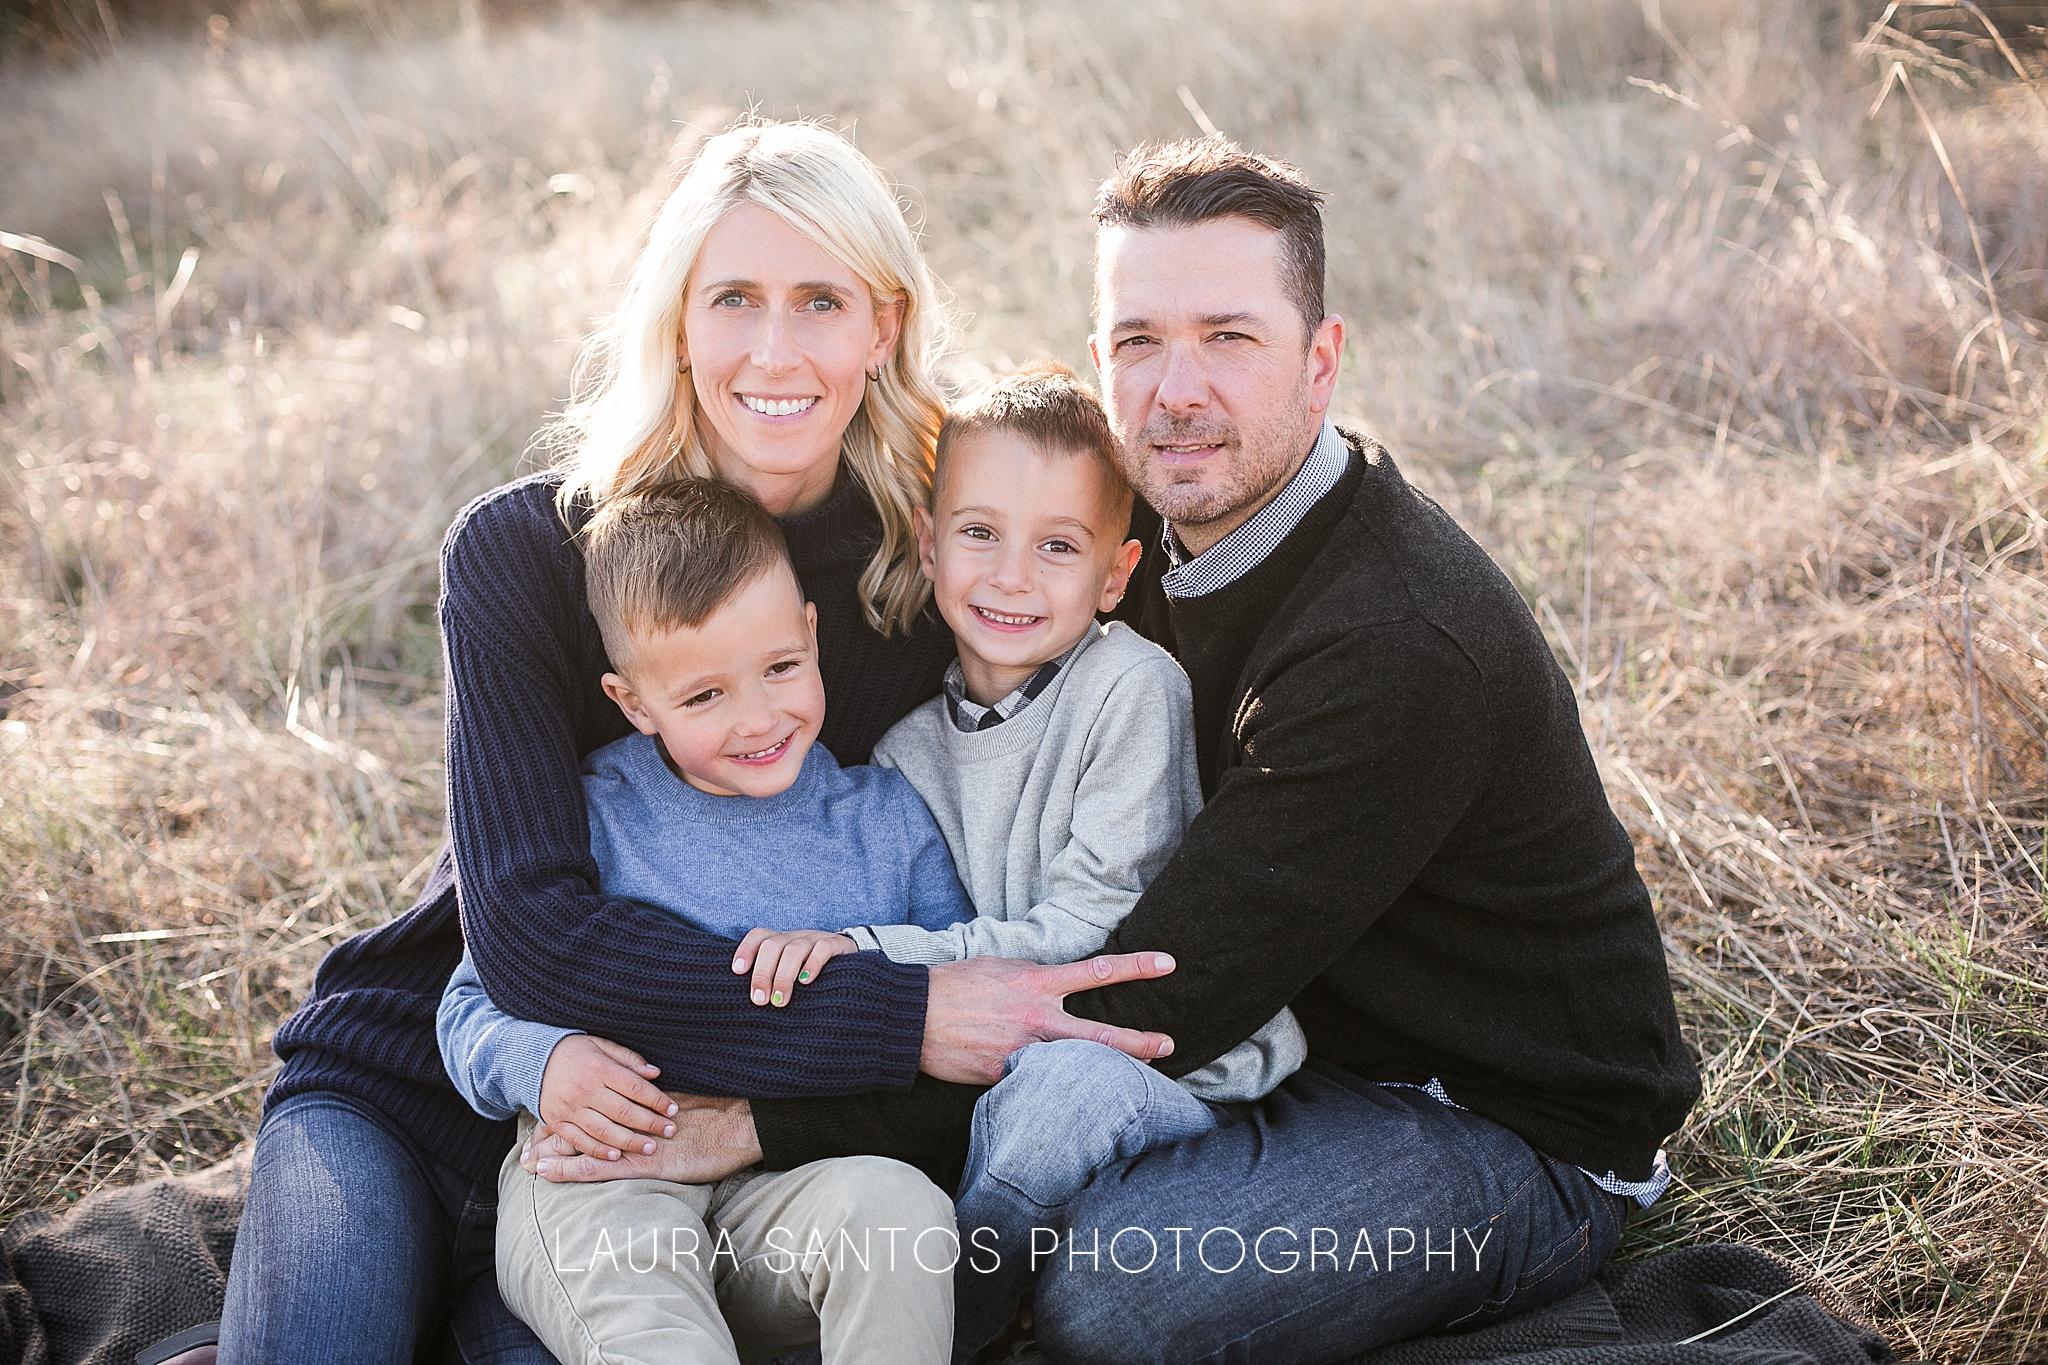 Laura Santos Photography Portland Oregon Family Photographer_0815.jpg